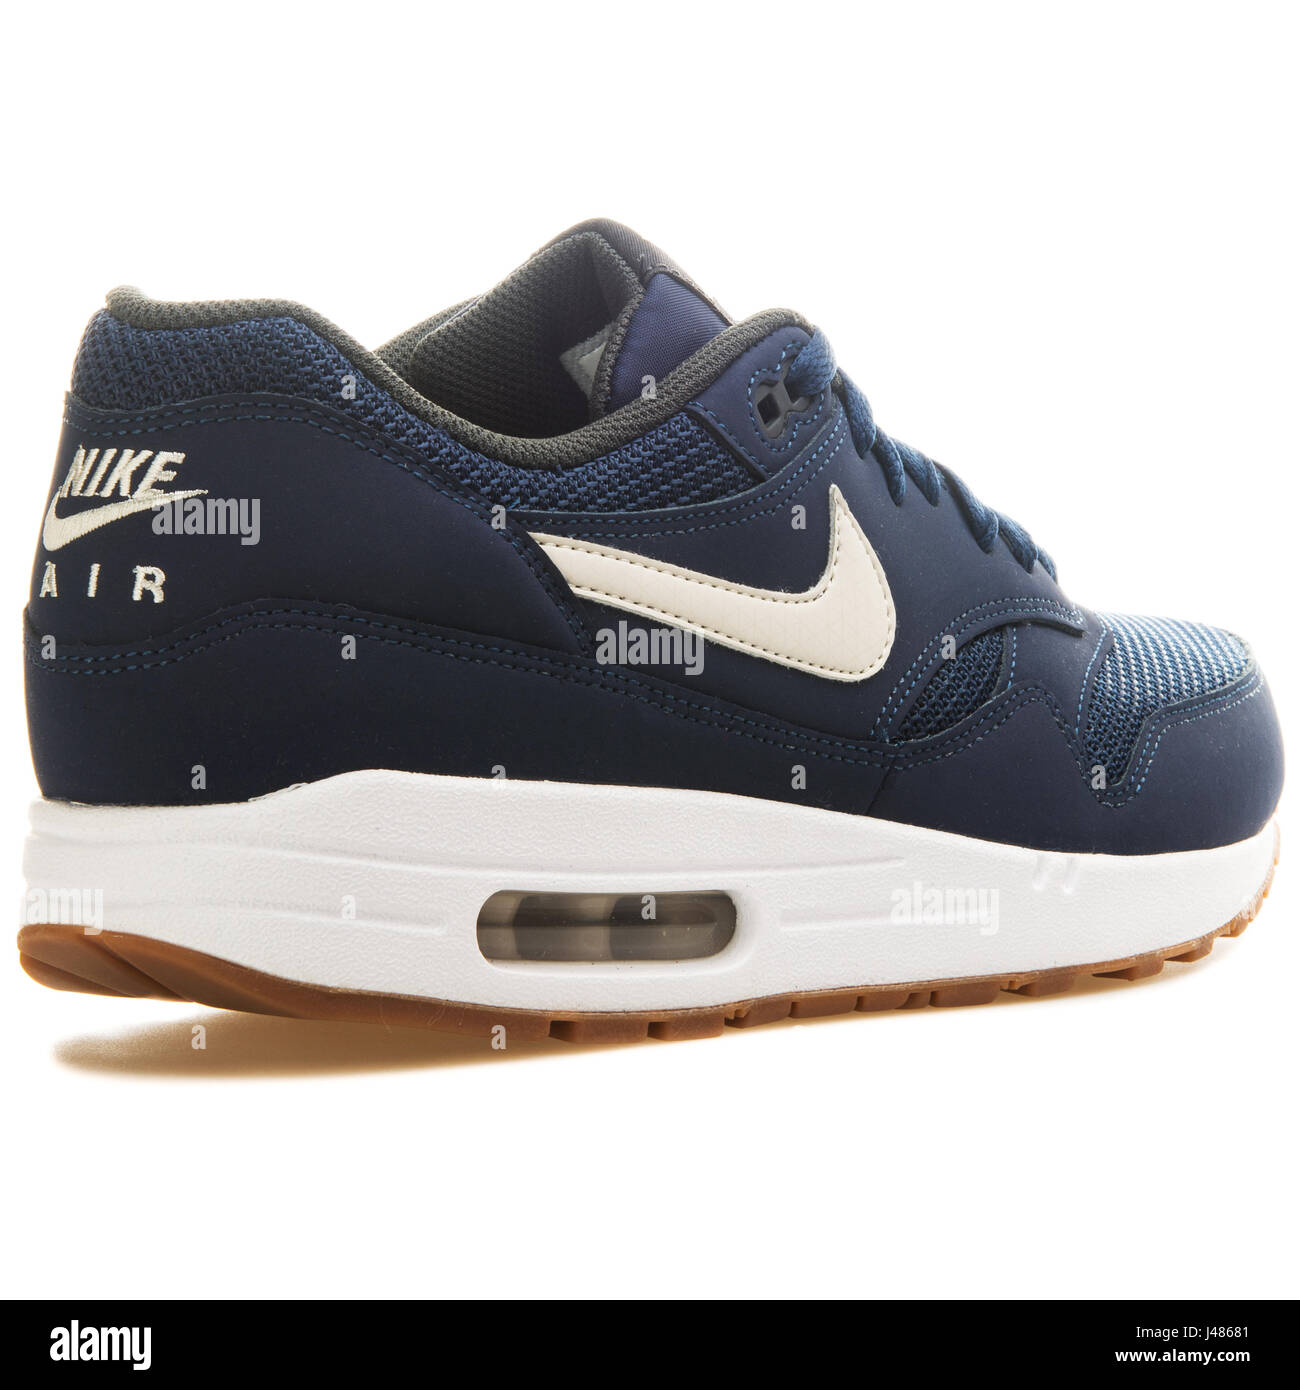 Nike Air Max 1 Essential 537383 401 Stock Photo: 140322113